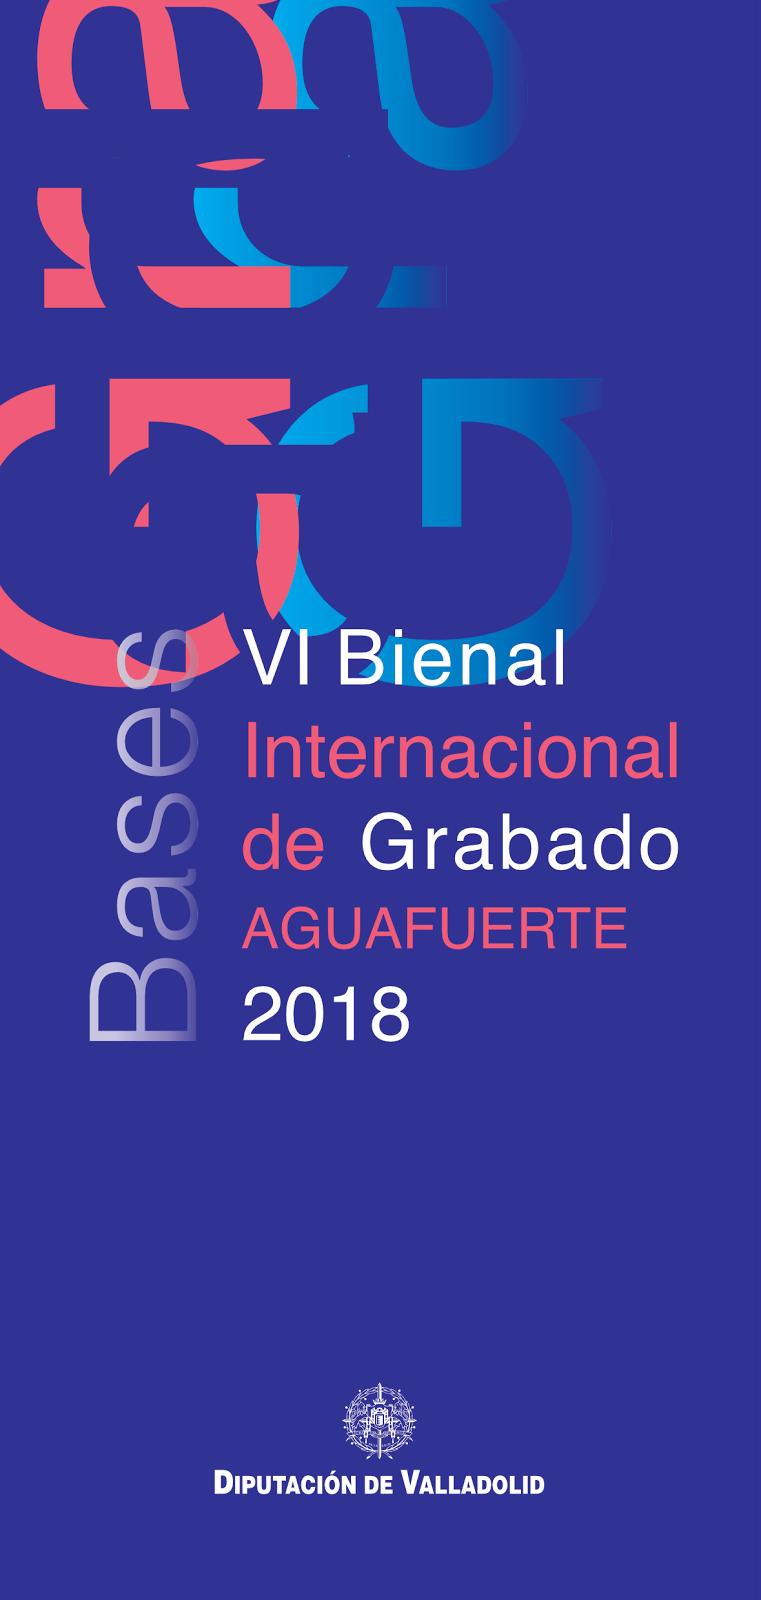 VI Bienal Internacional de Grabado Aguafuerte